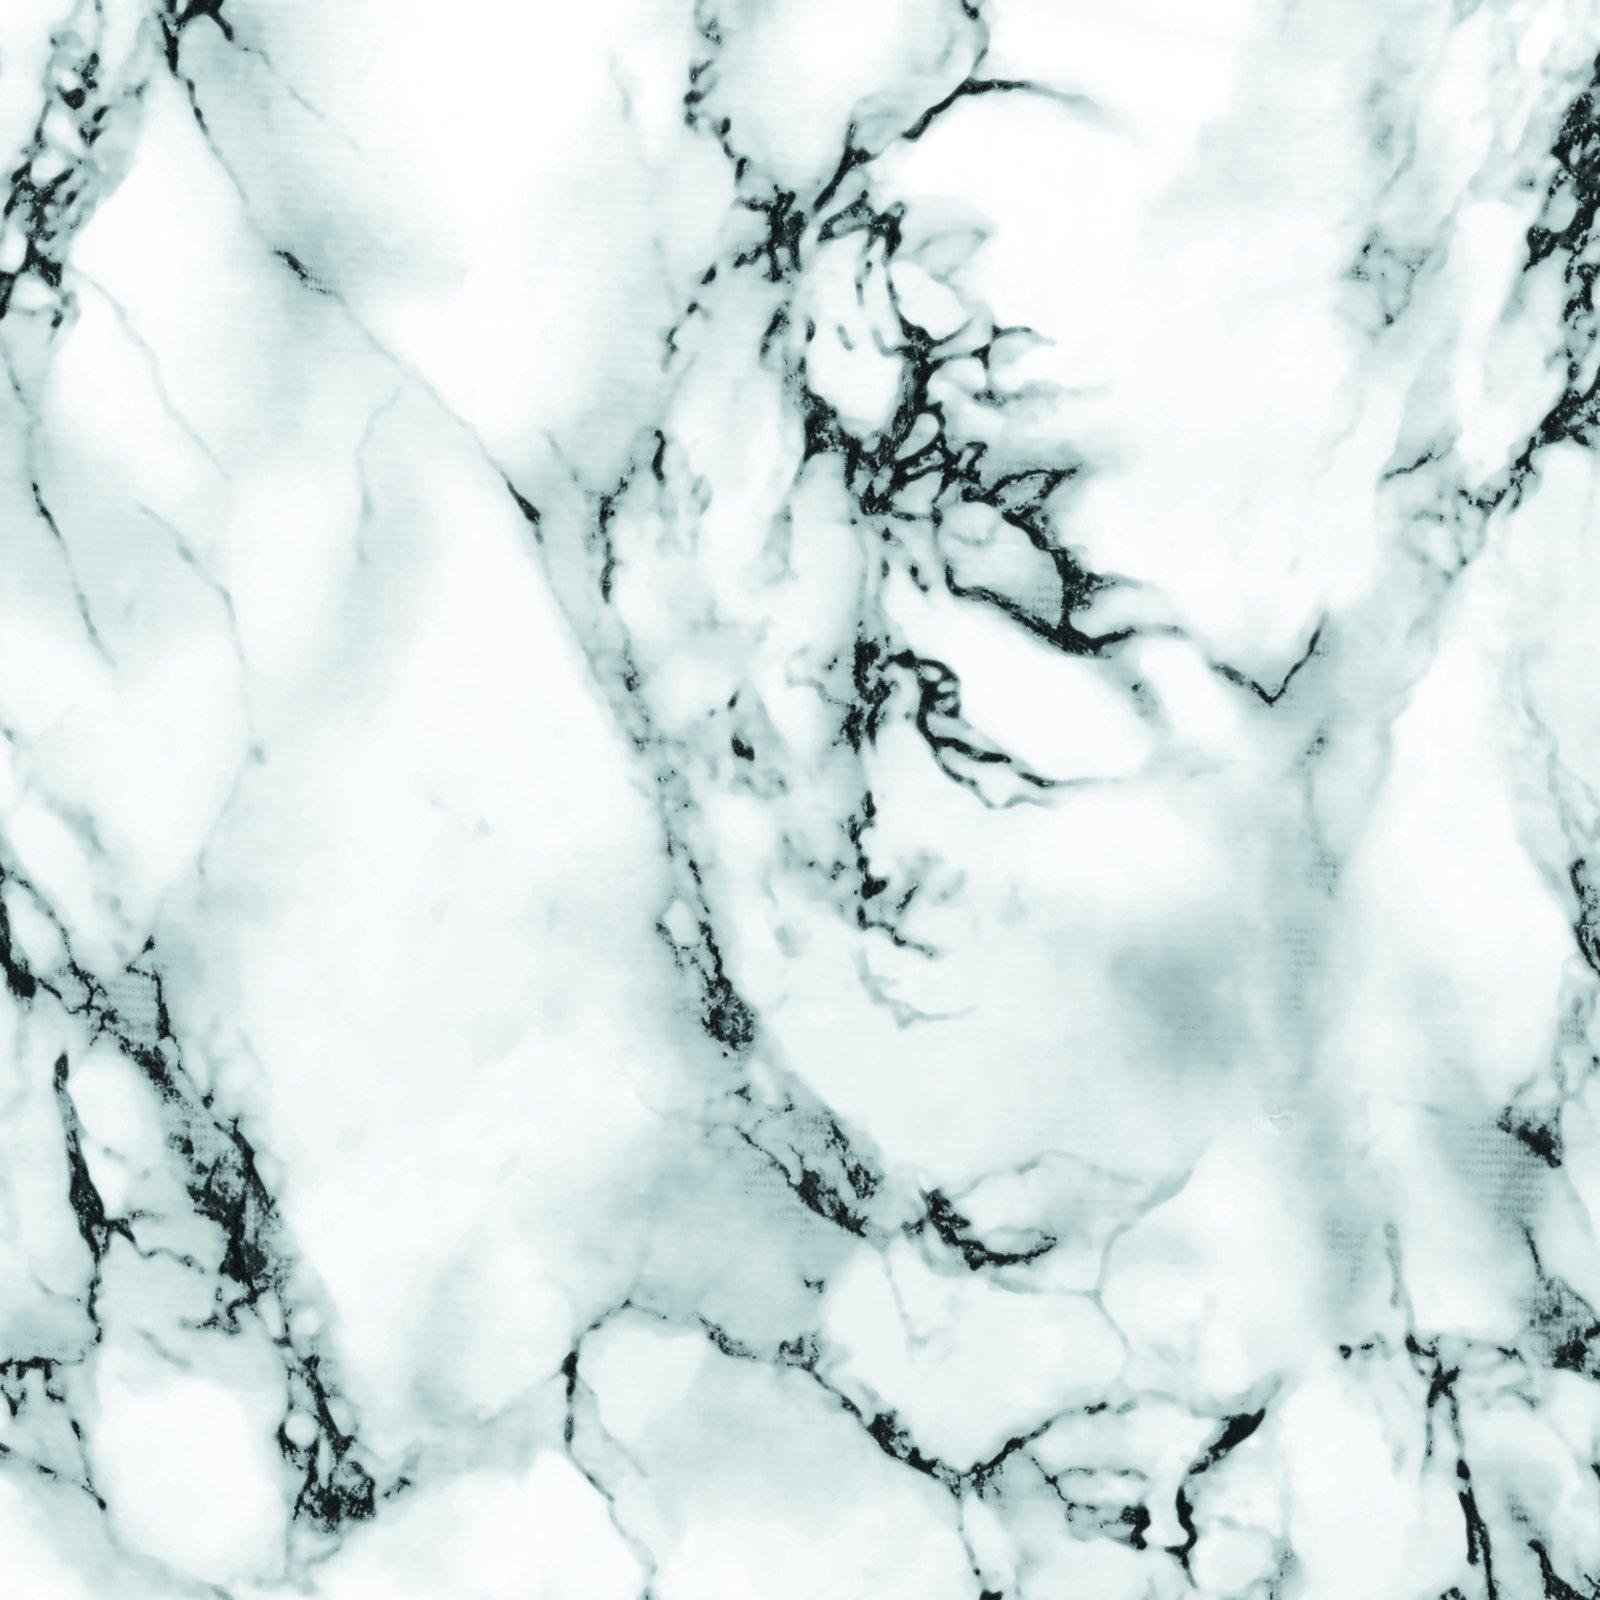 d-c fix Klebefolie - weiß - Marmor - 67,5x200cm